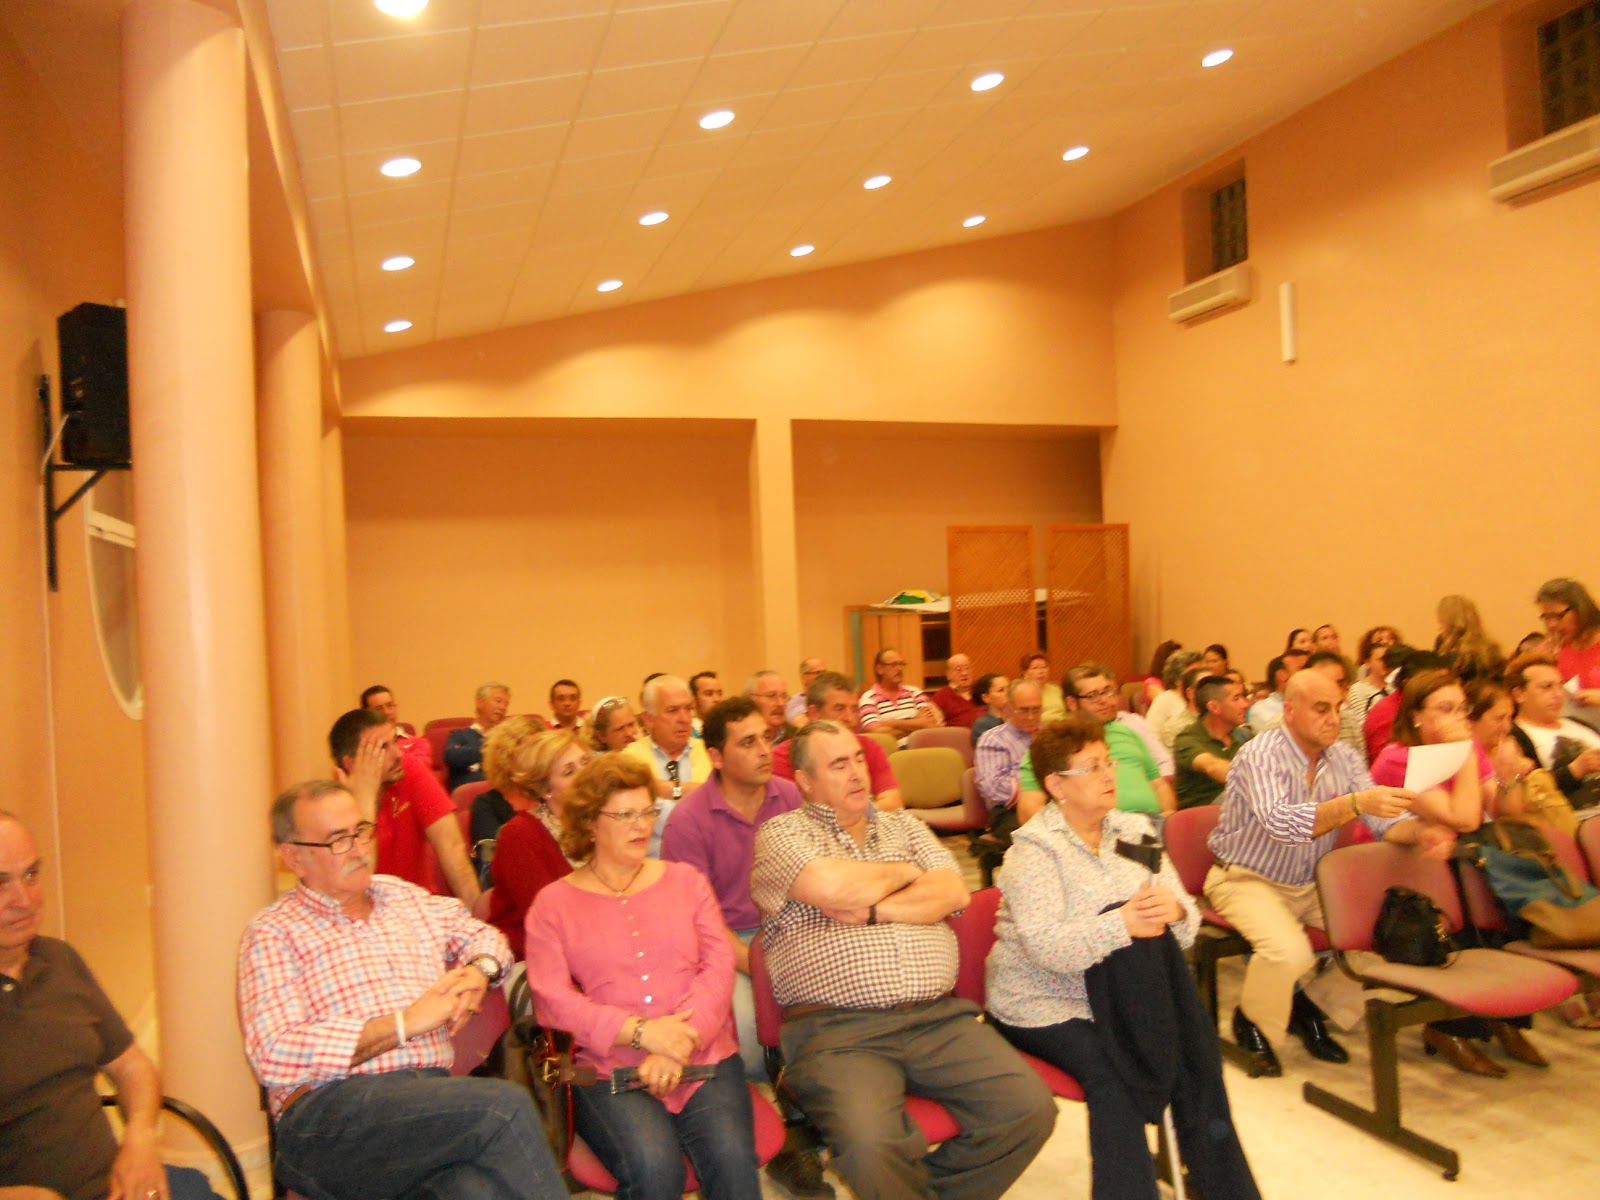 Asamblea Extraordinaria de la Hermandad del Rocío de Isla Cristina